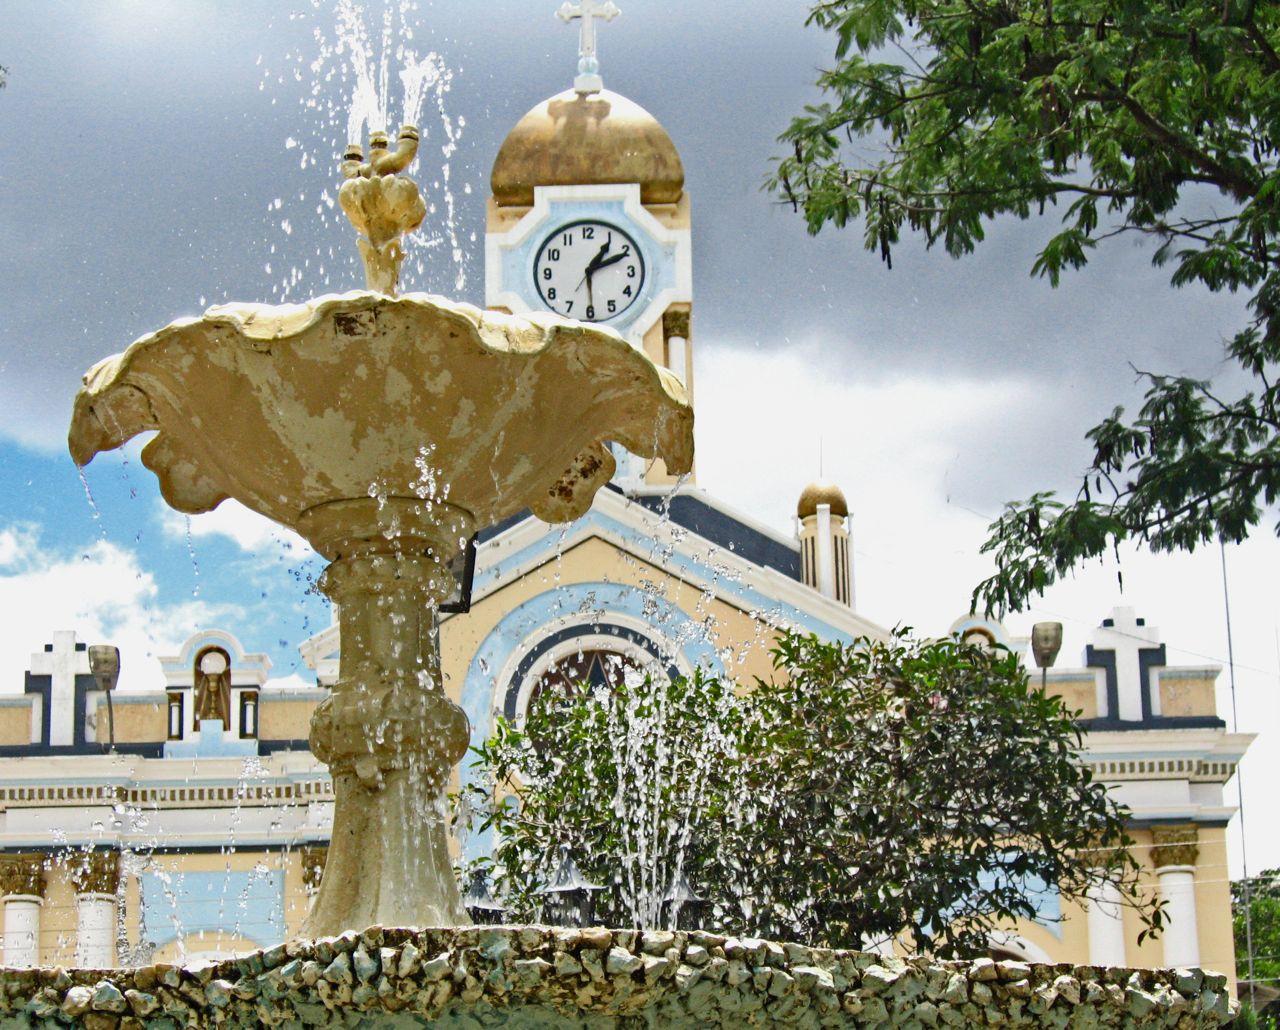 Vilcabamba cathedraln